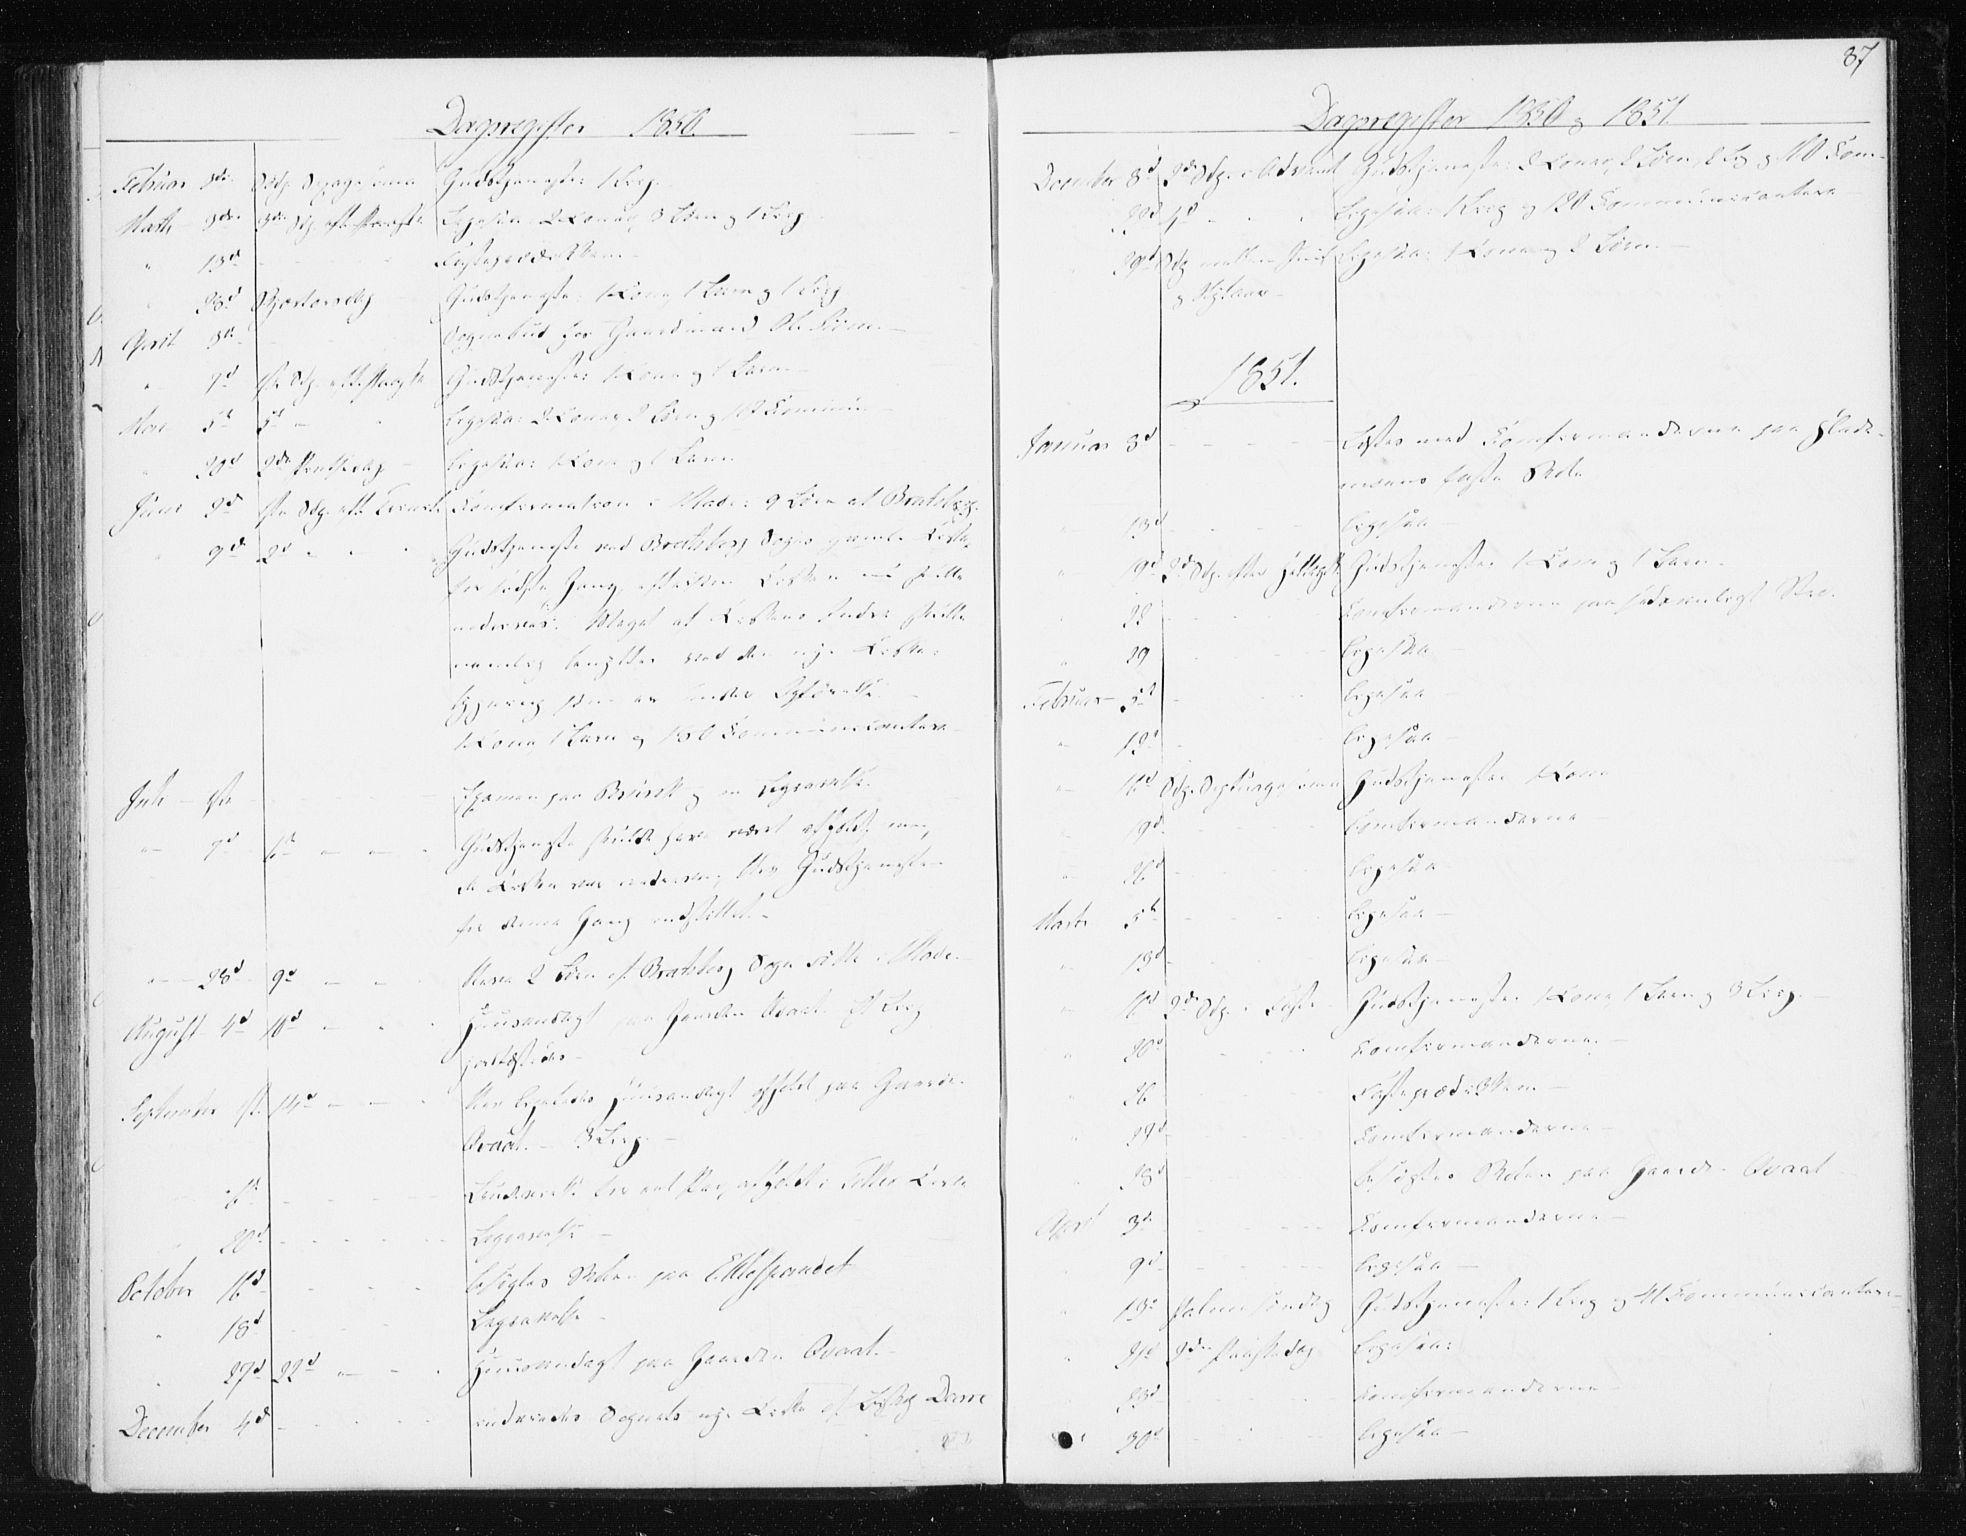 SAT, Ministerialprotokoller, klokkerbøker og fødselsregistre - Sør-Trøndelag, 608/L0332: Parish register (official) no. 608A01, 1848-1861, p. 87